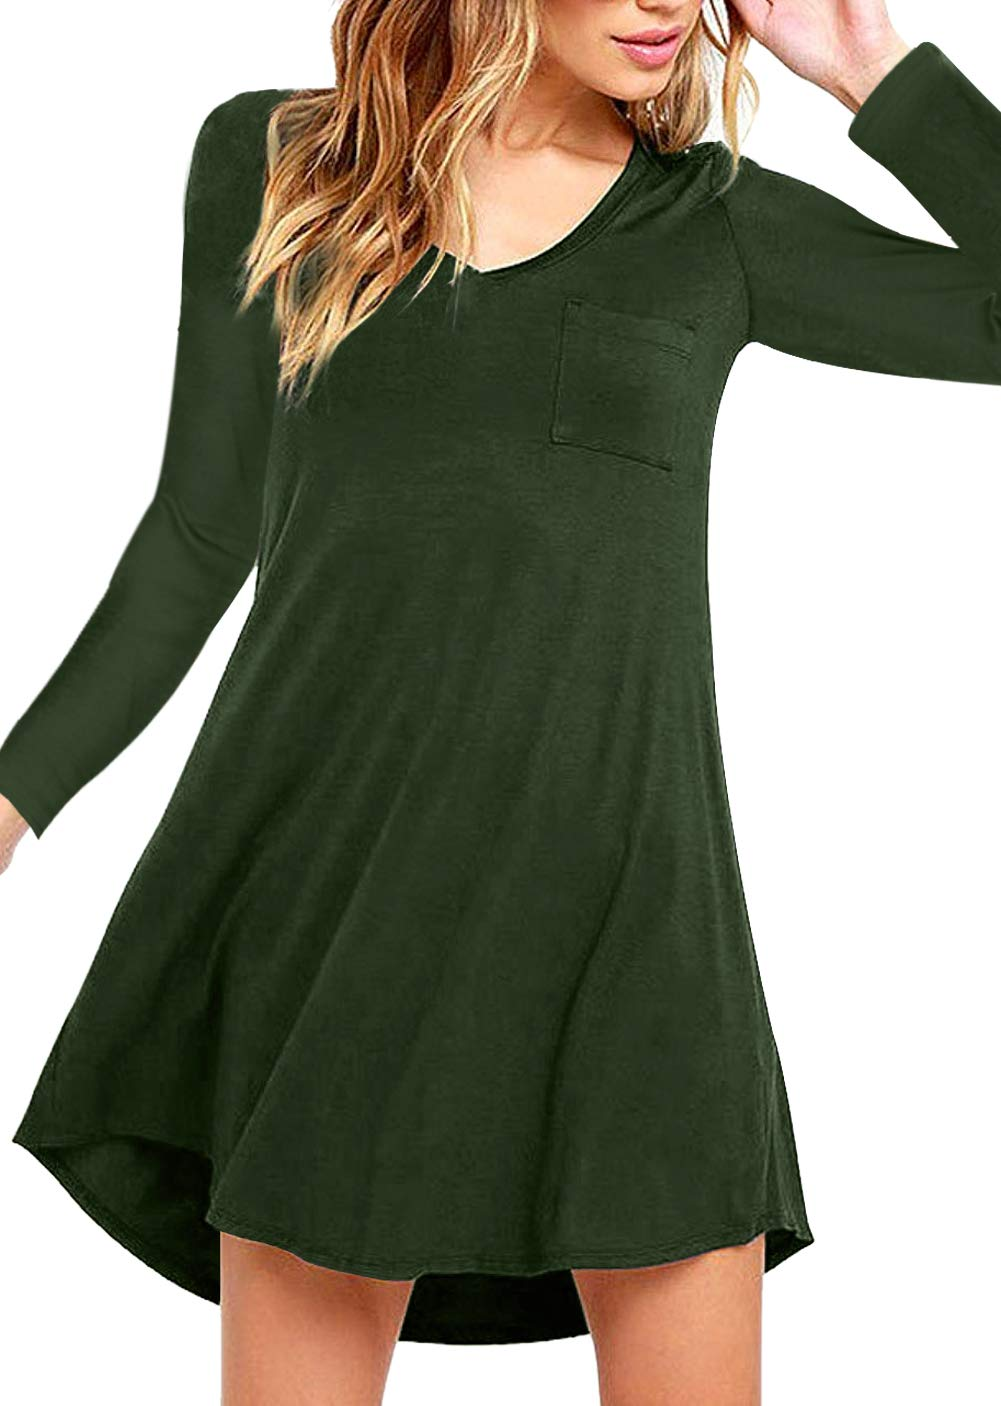 Eanklosco Womens Casual Short Sleeve Plain Pocket V Neck T Shirt Tunic Dress (Green-1, M)